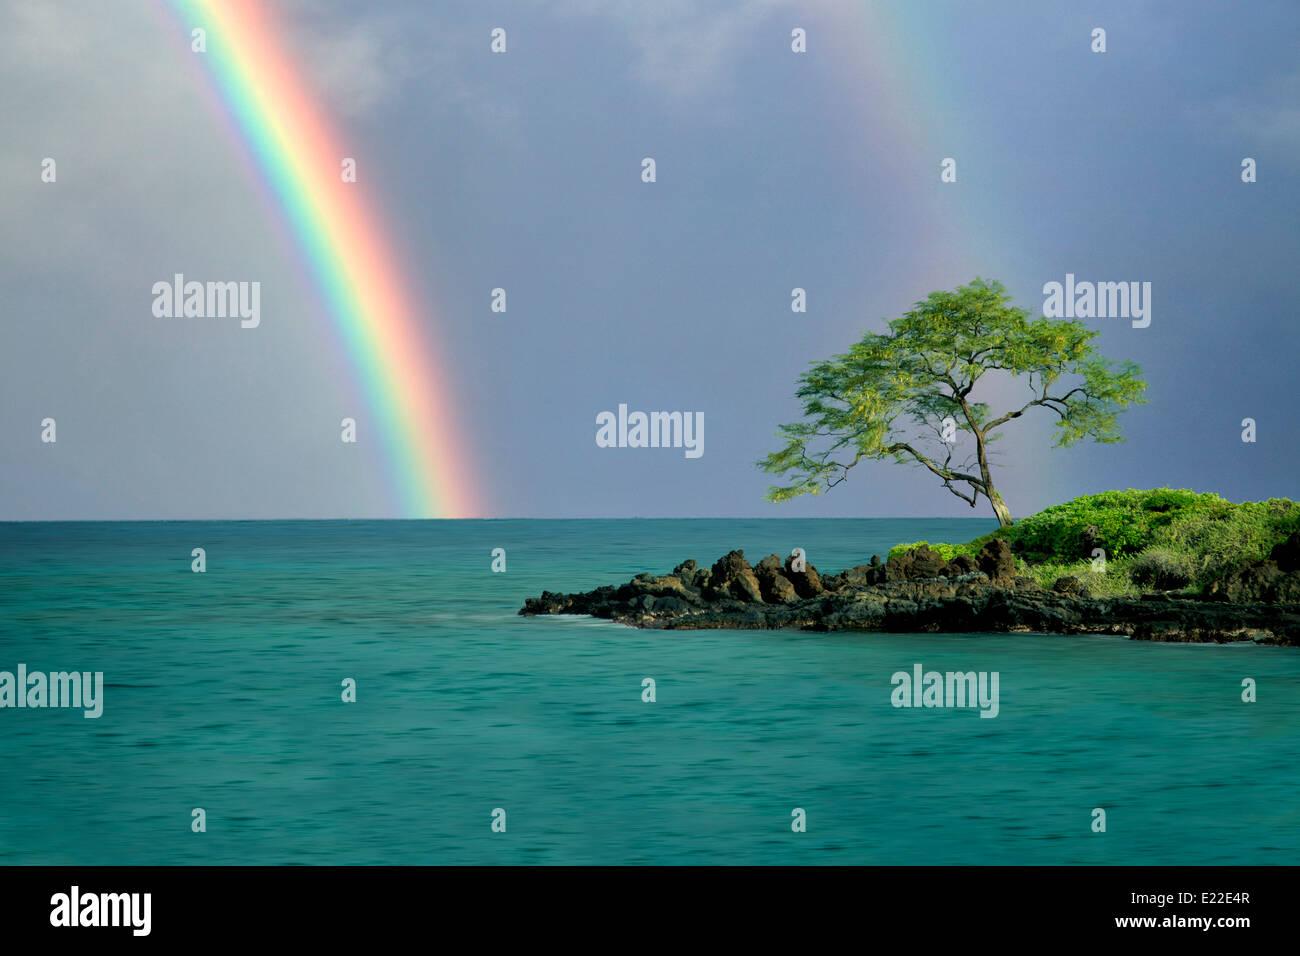 Lone tree and rainbow. Maui, Hawaii - Stock Image